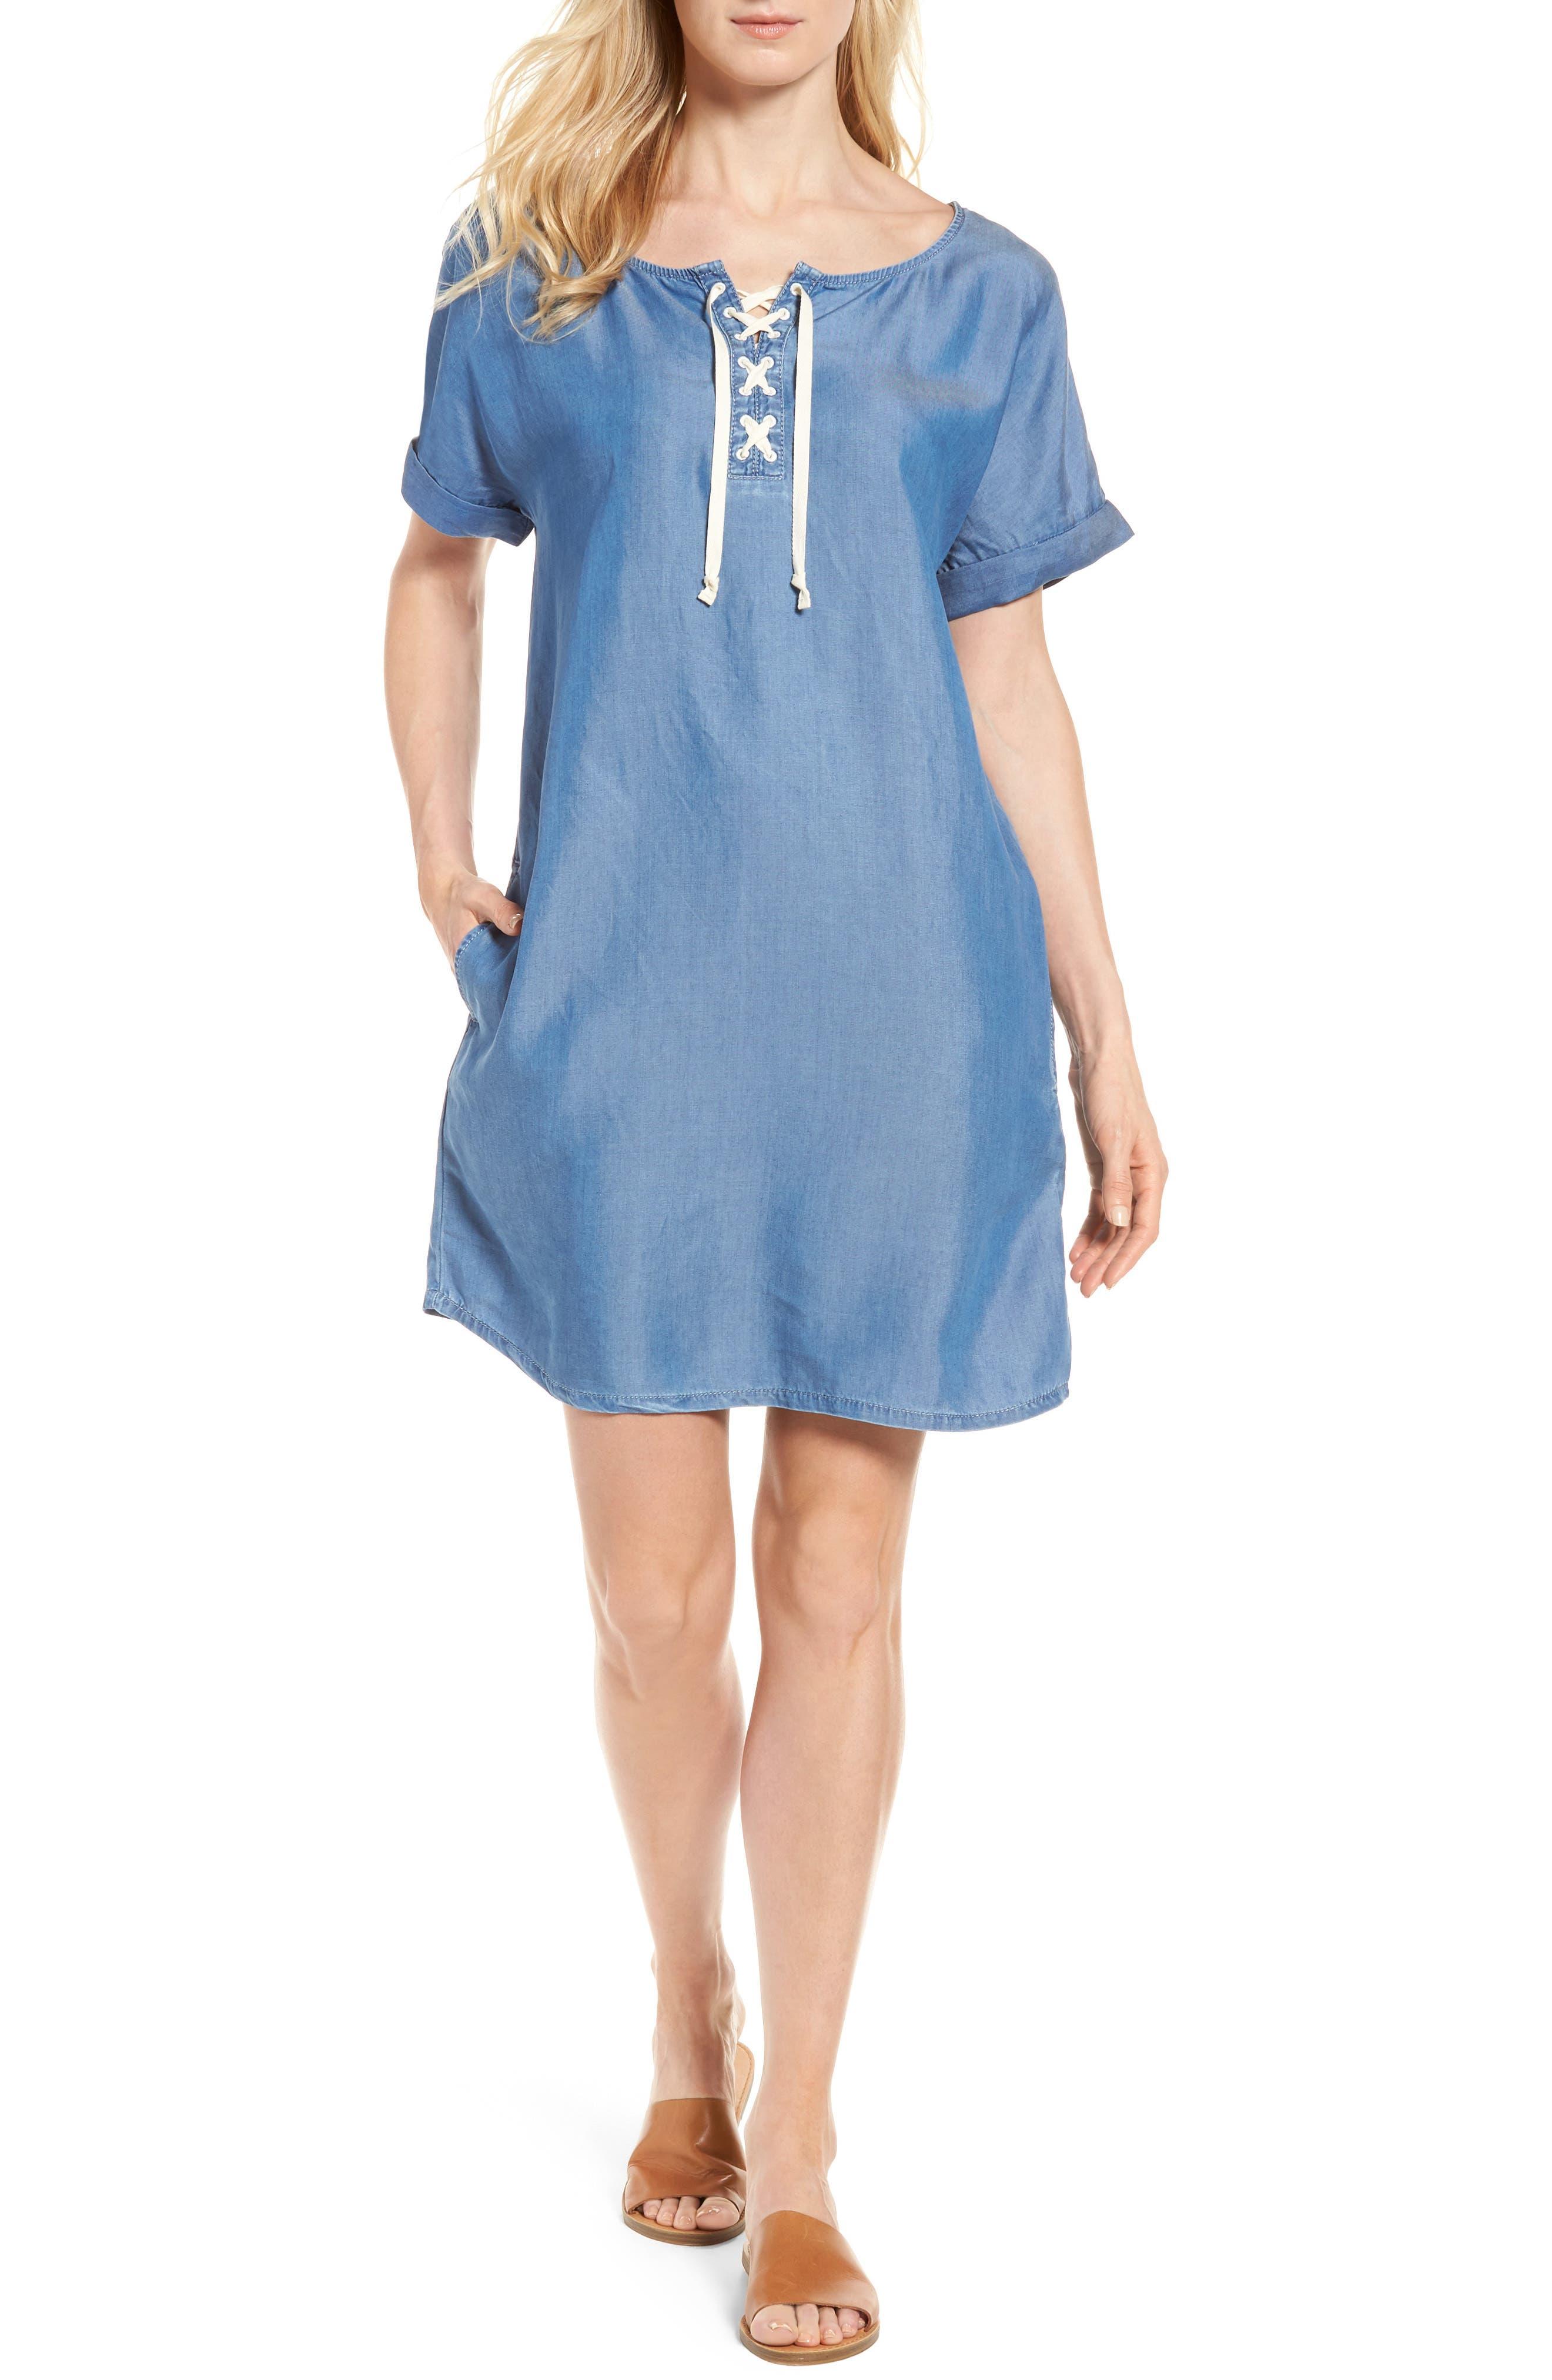 Alternate Image 1 Selected - Caslon® Lace-Up Shift Dress (Regular & Petite)